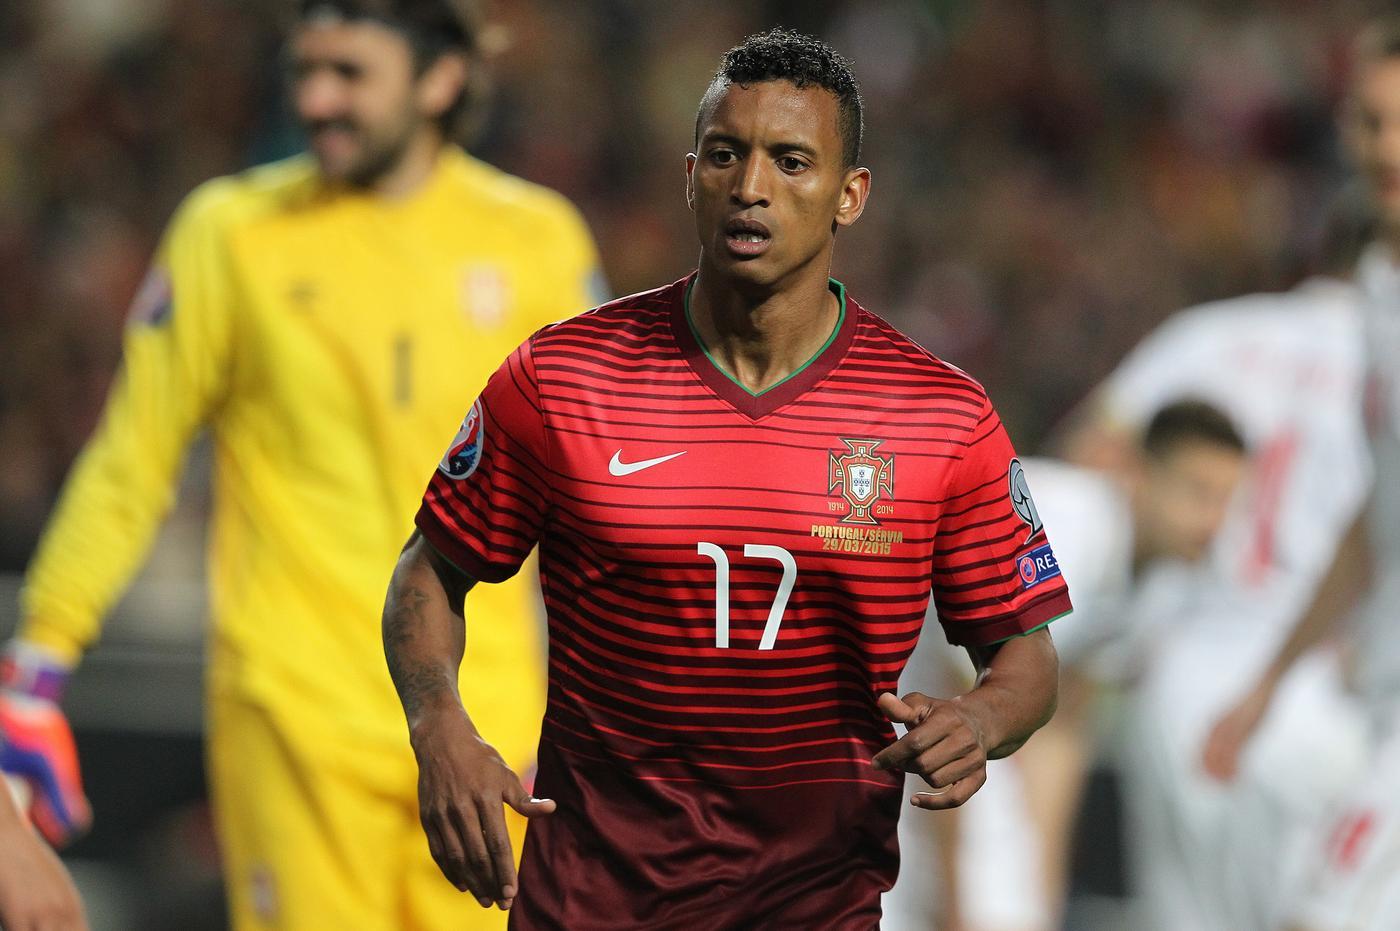 Roma make £9million transfer bid for Manchester United reject Luis Nani